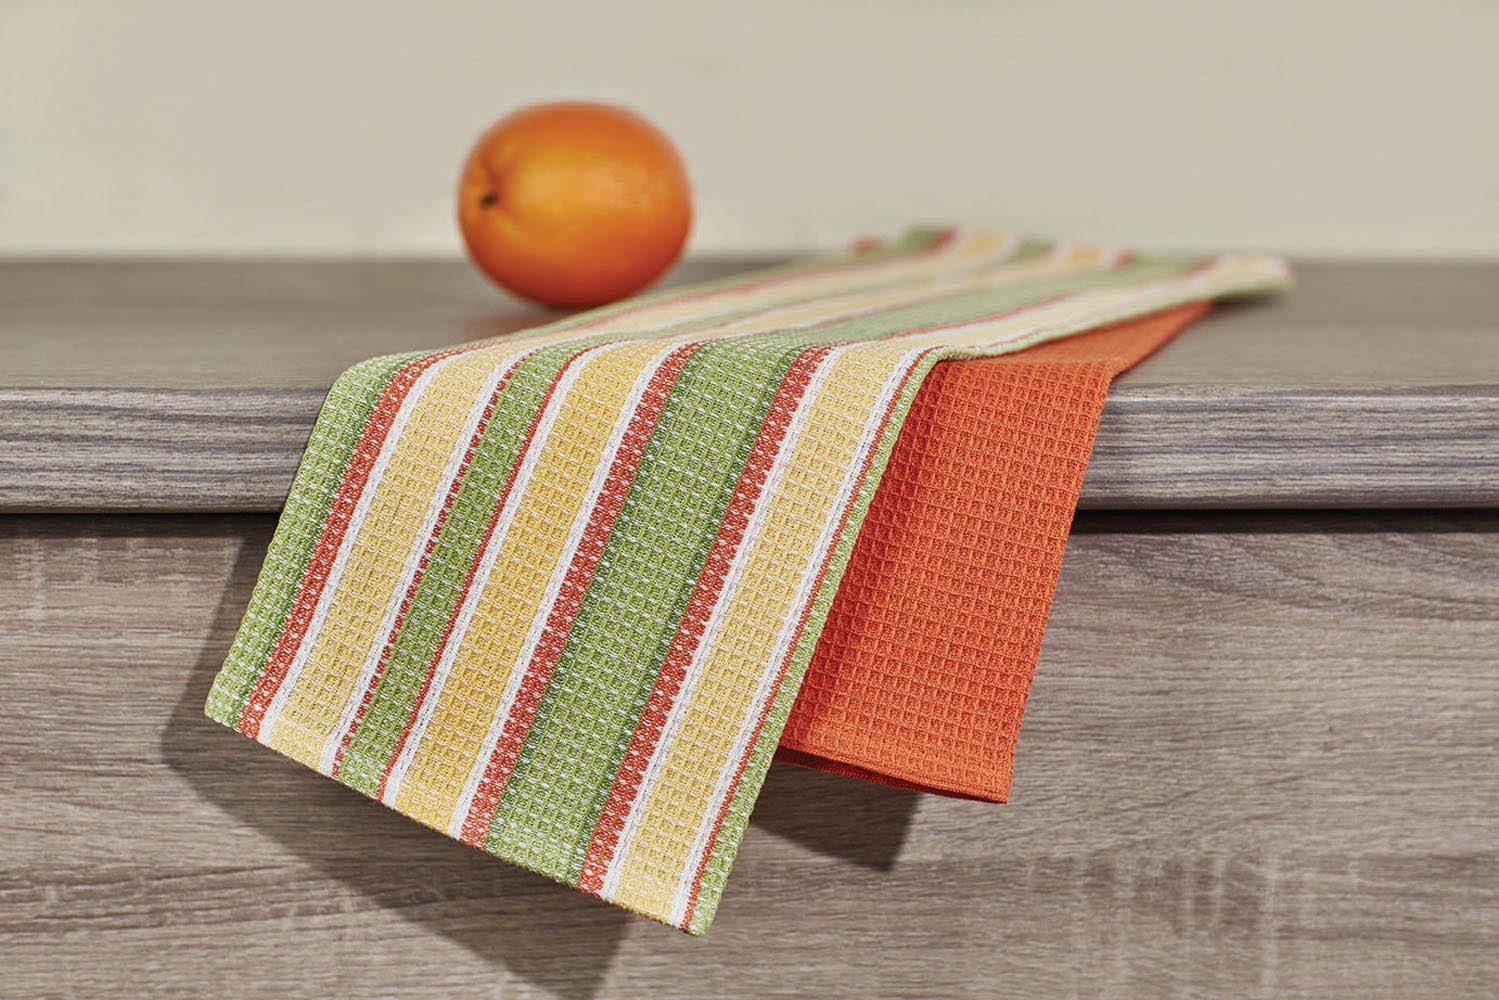 Полотенца Primavelle Кухонное полотенце Latte Цвет: Зеленый (40х60 см - 2 шт) bon appetit кухонное полотенце cake цвет зеленый 40х60 см 2 шт